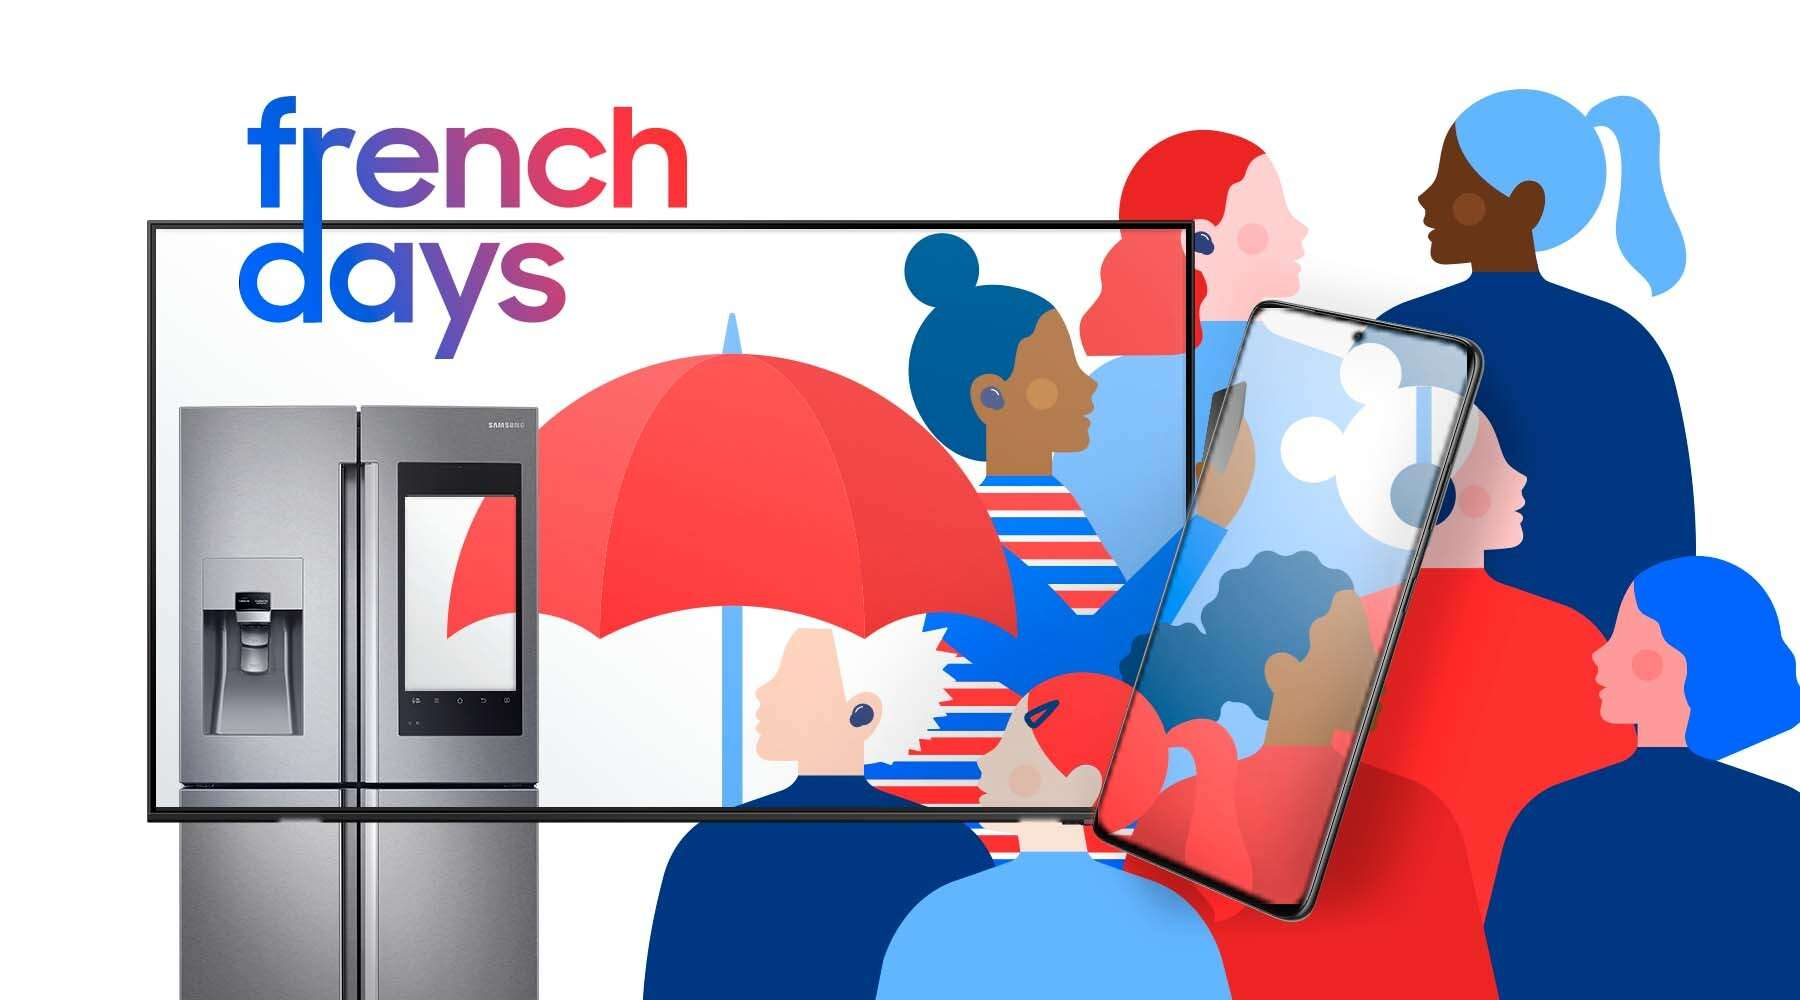 C'est les French Days chez Samsung ! © Samsung